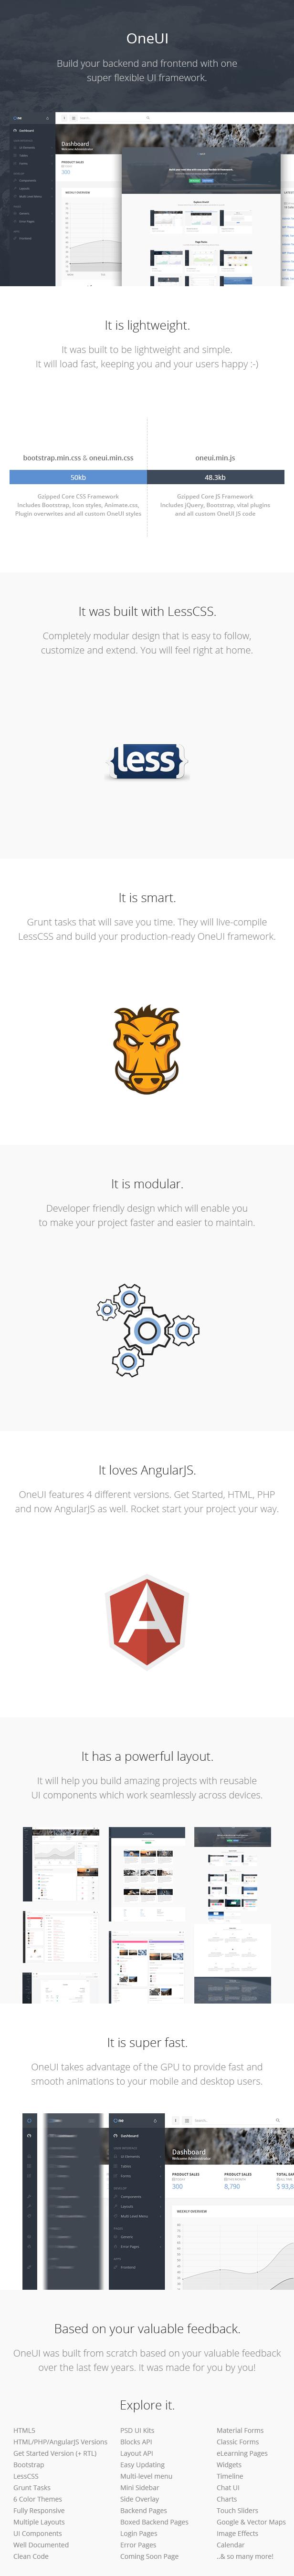 最新OneUI bootstrap AngularJS后台管理模版UI框架